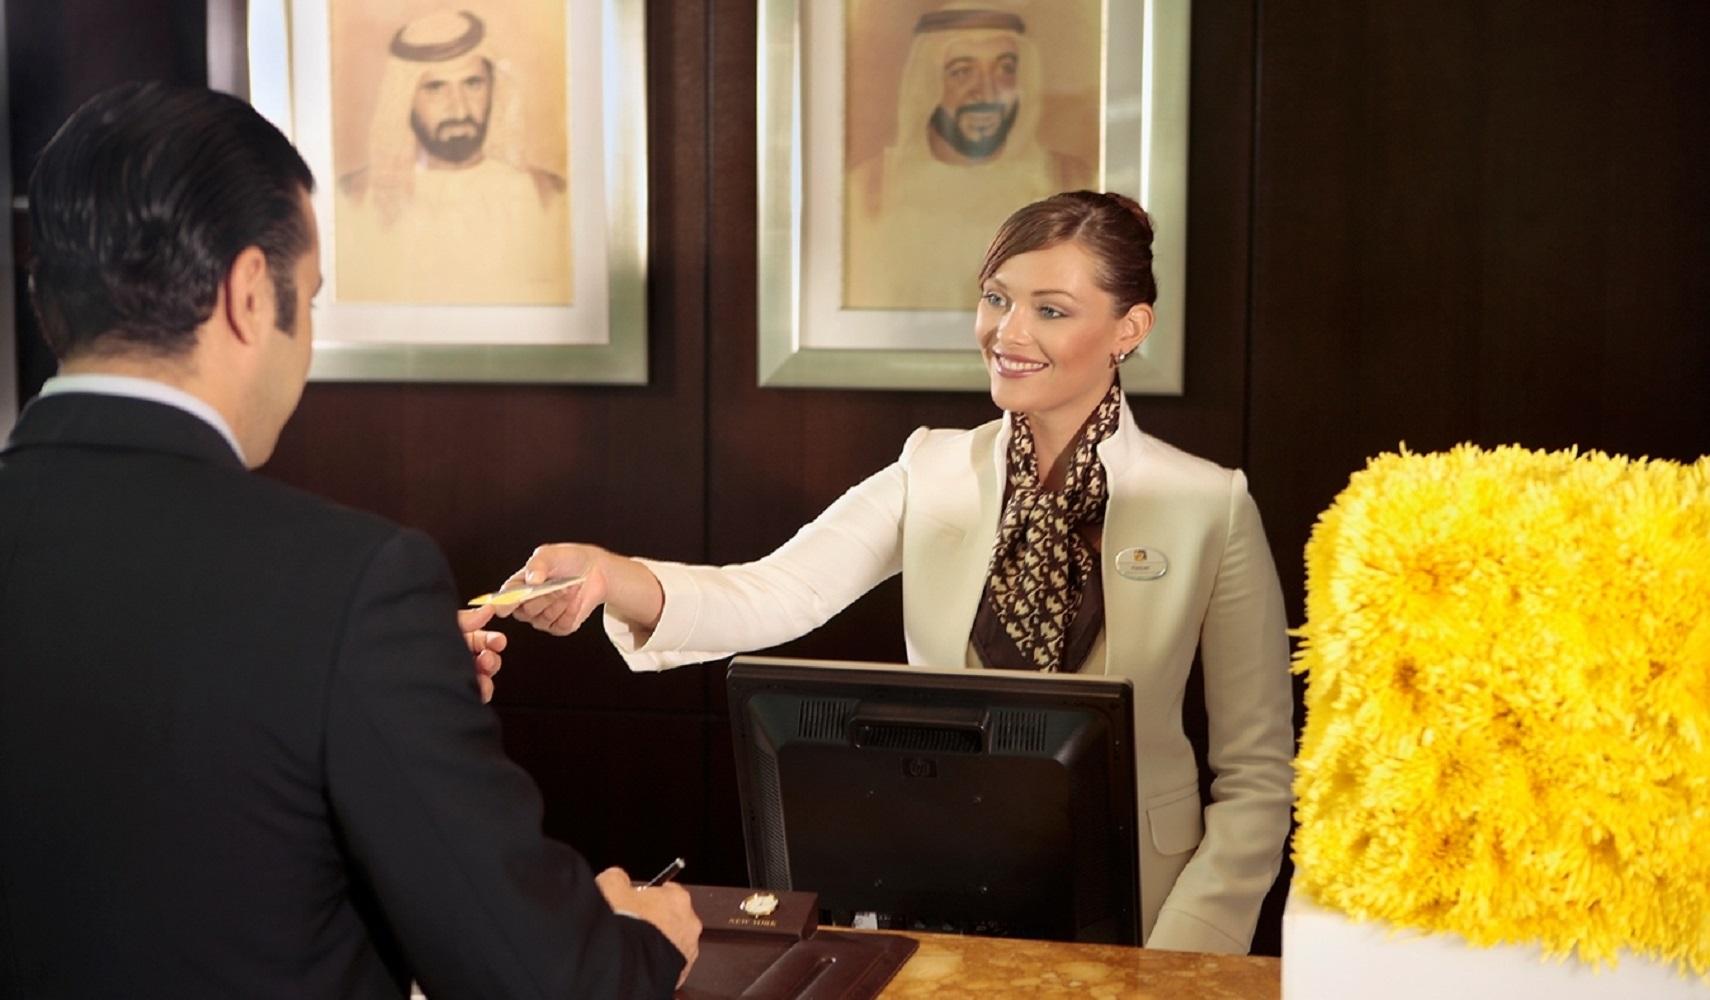 Менеджер гостеприимства